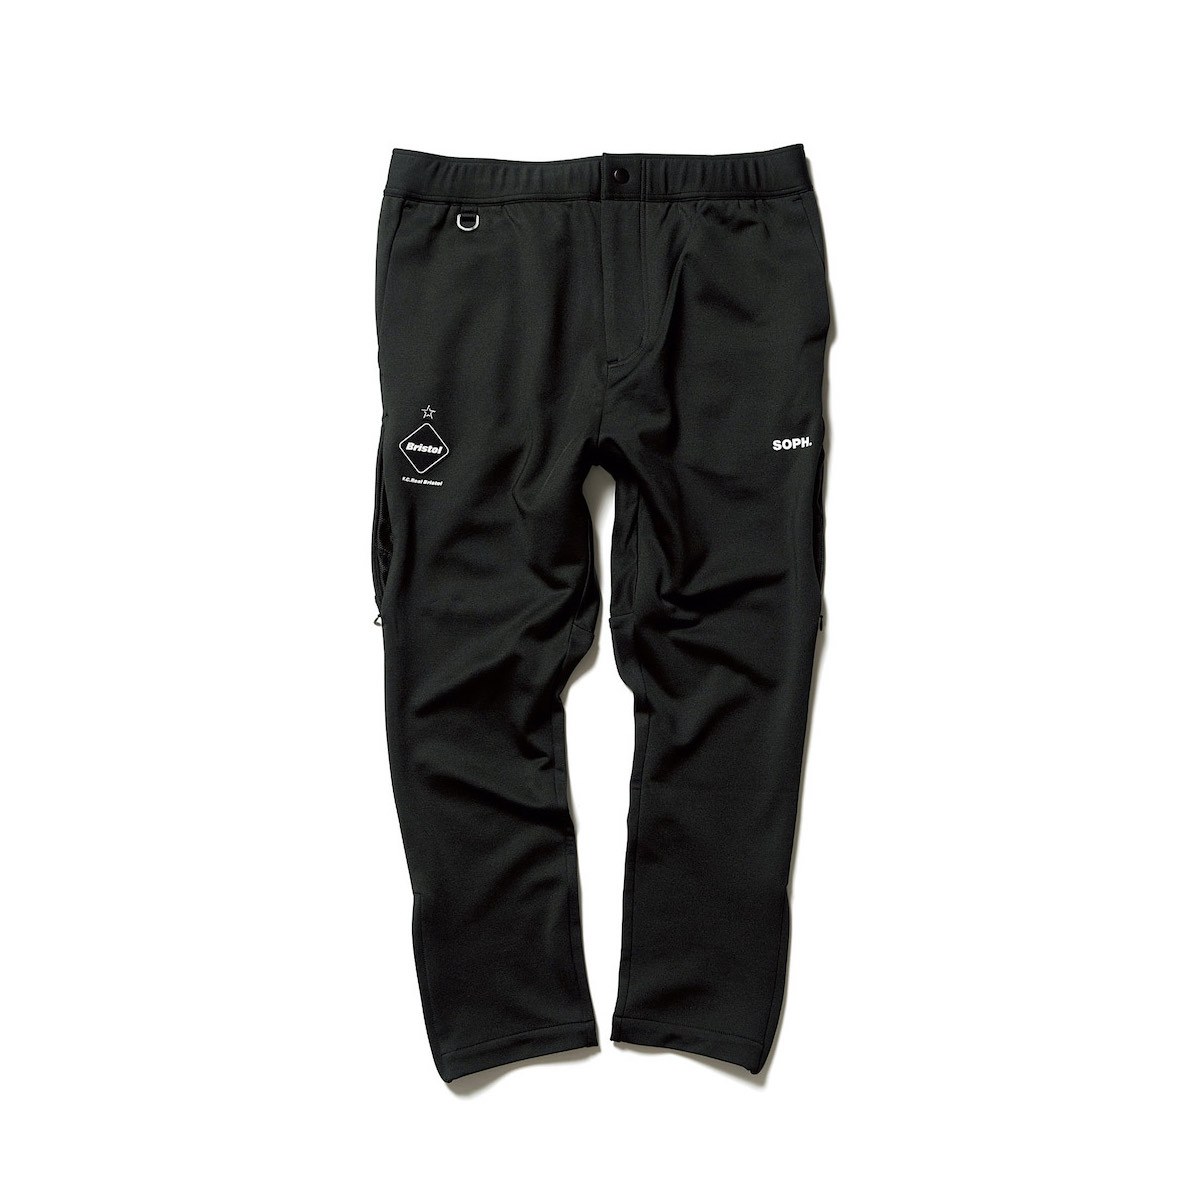 F.C.Real Bristol / PDK PANTS (Black)